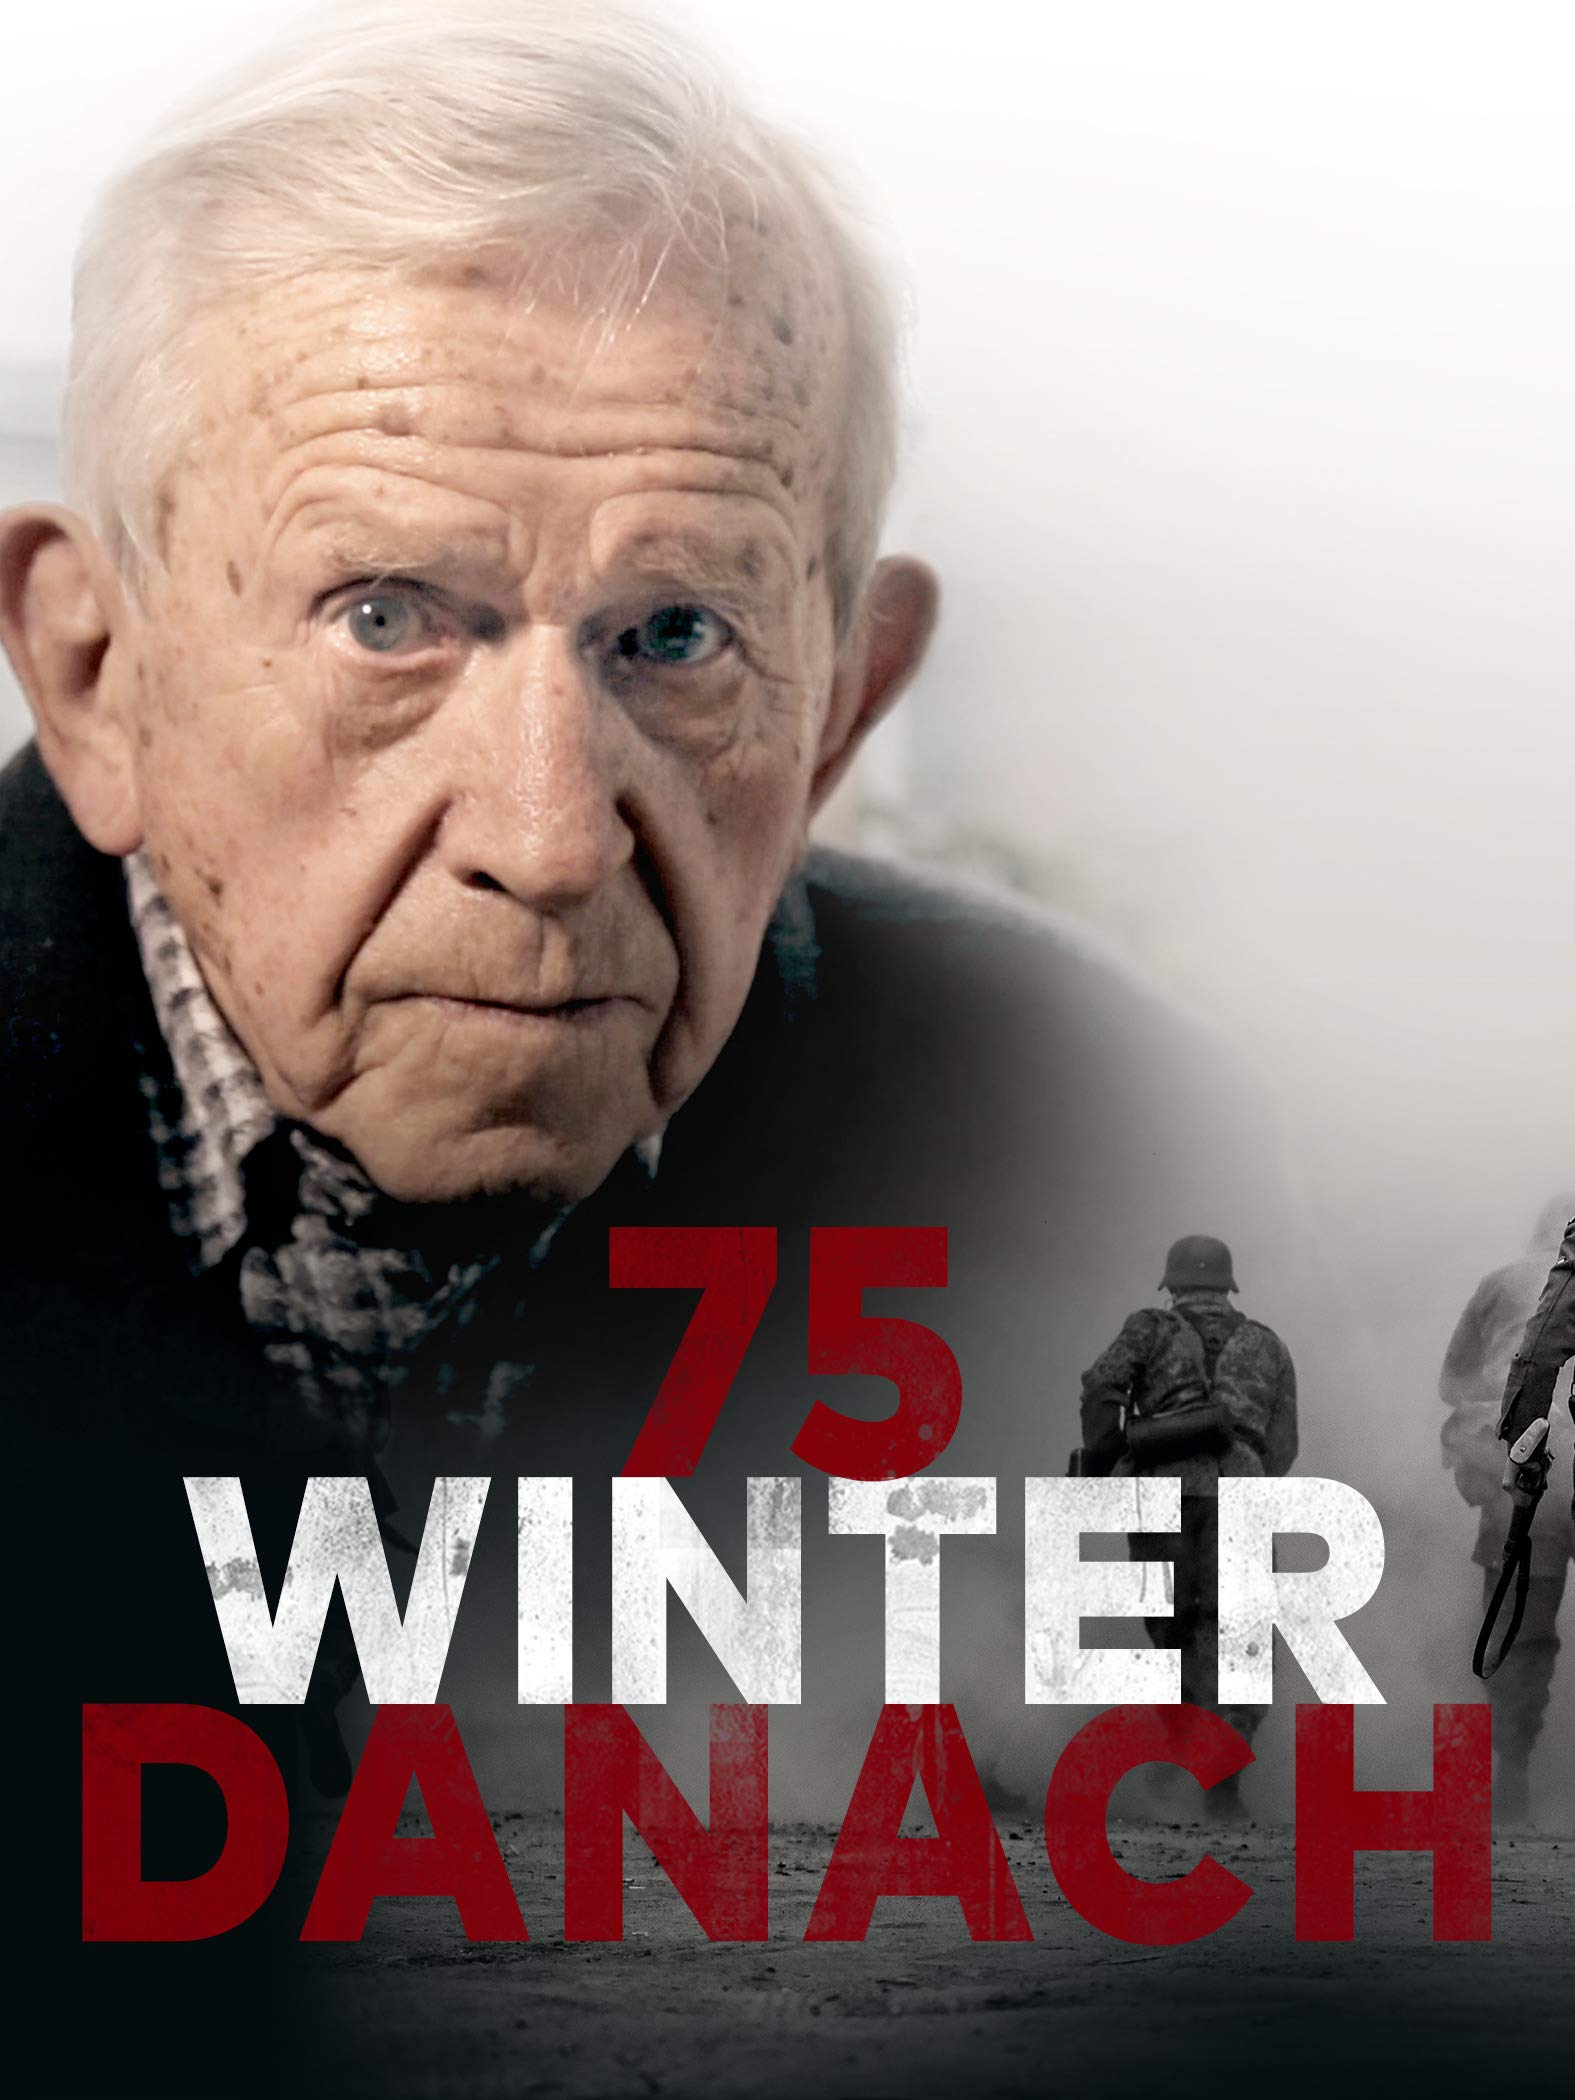 75 Winter Danach